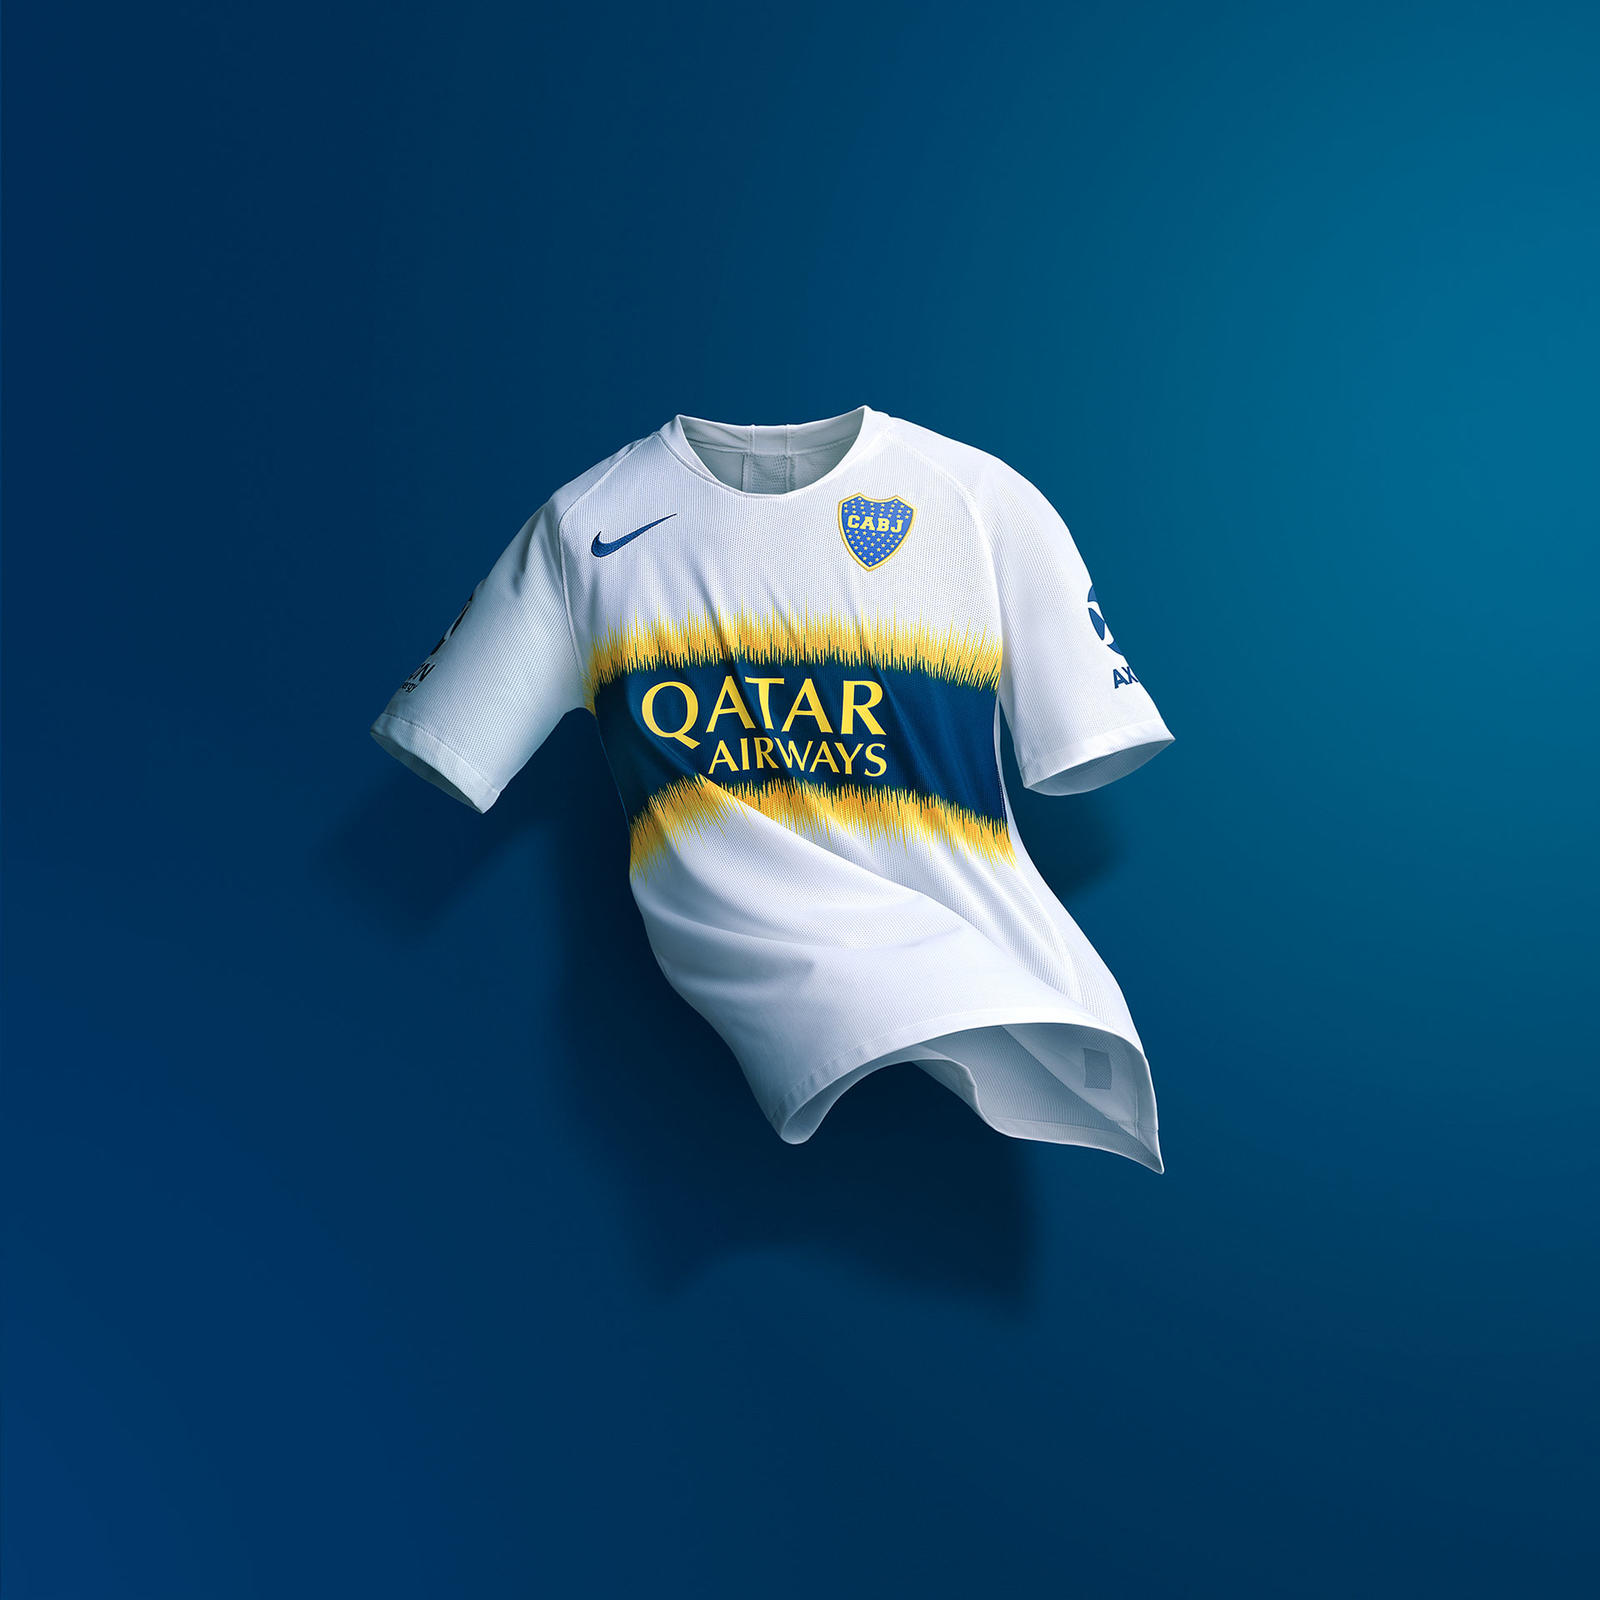 Boca Juniors' Awaken La Bombonera Energy with New Kits - Nike News